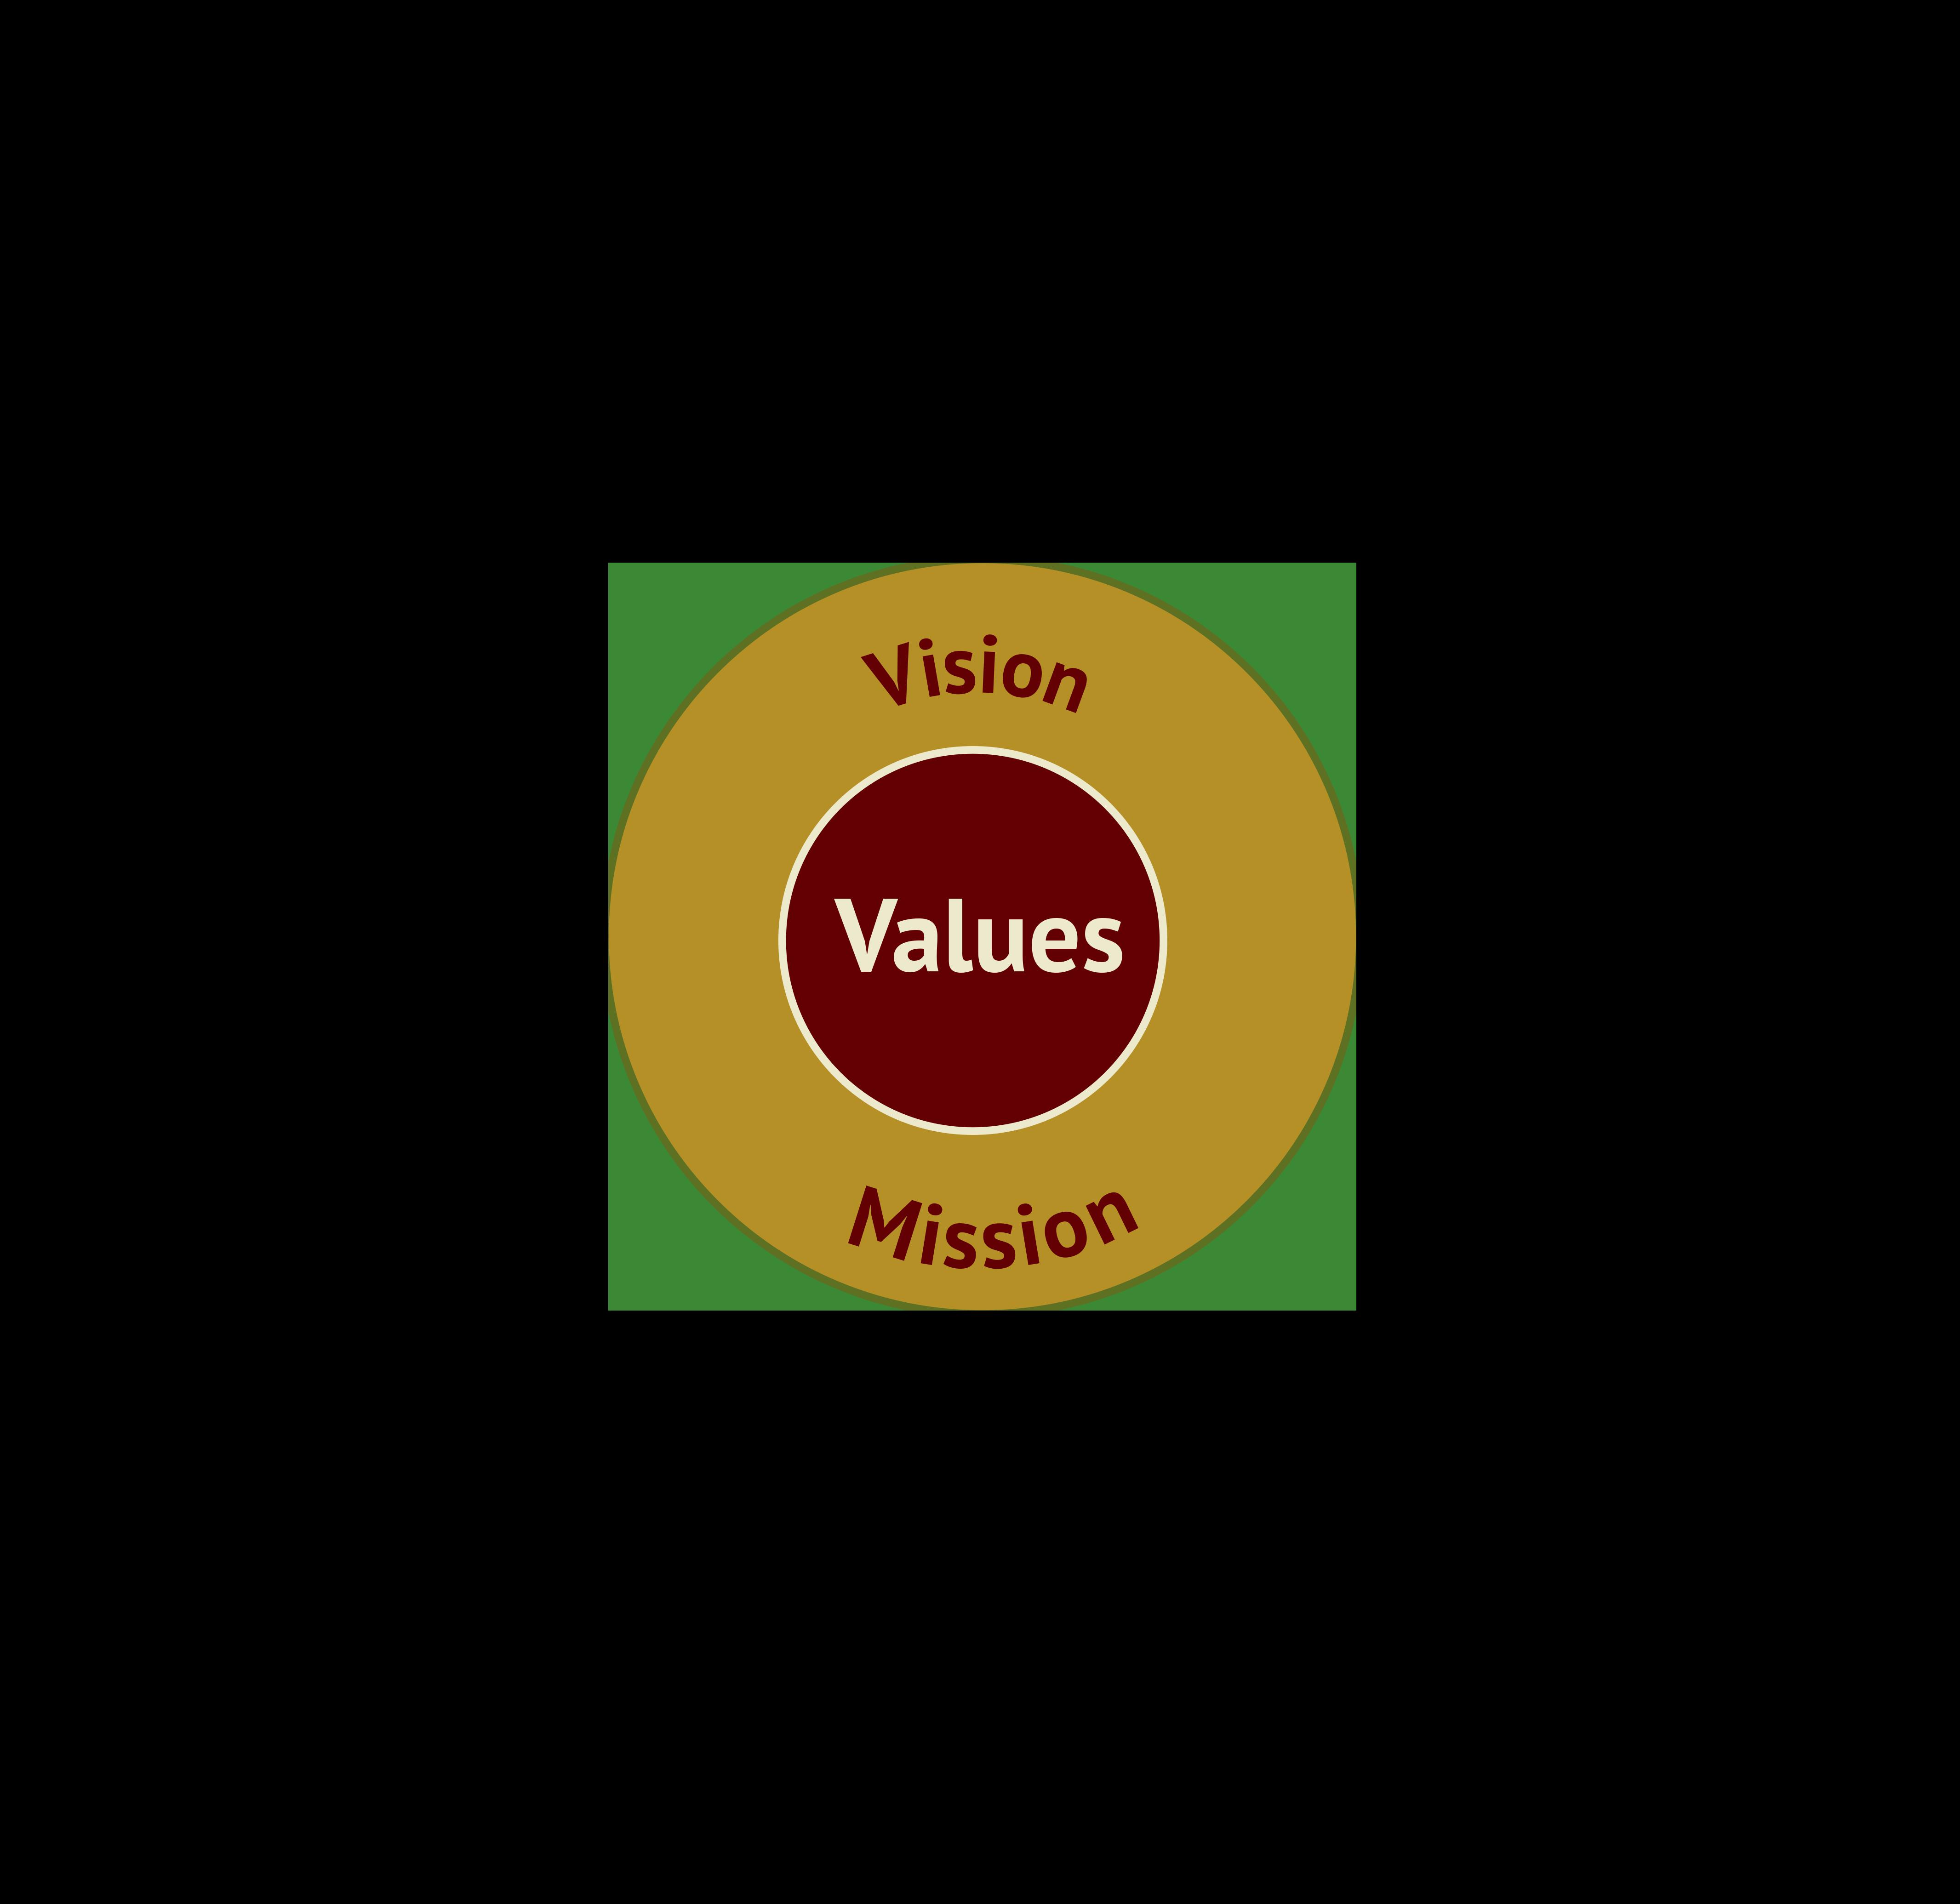 Values mission vision